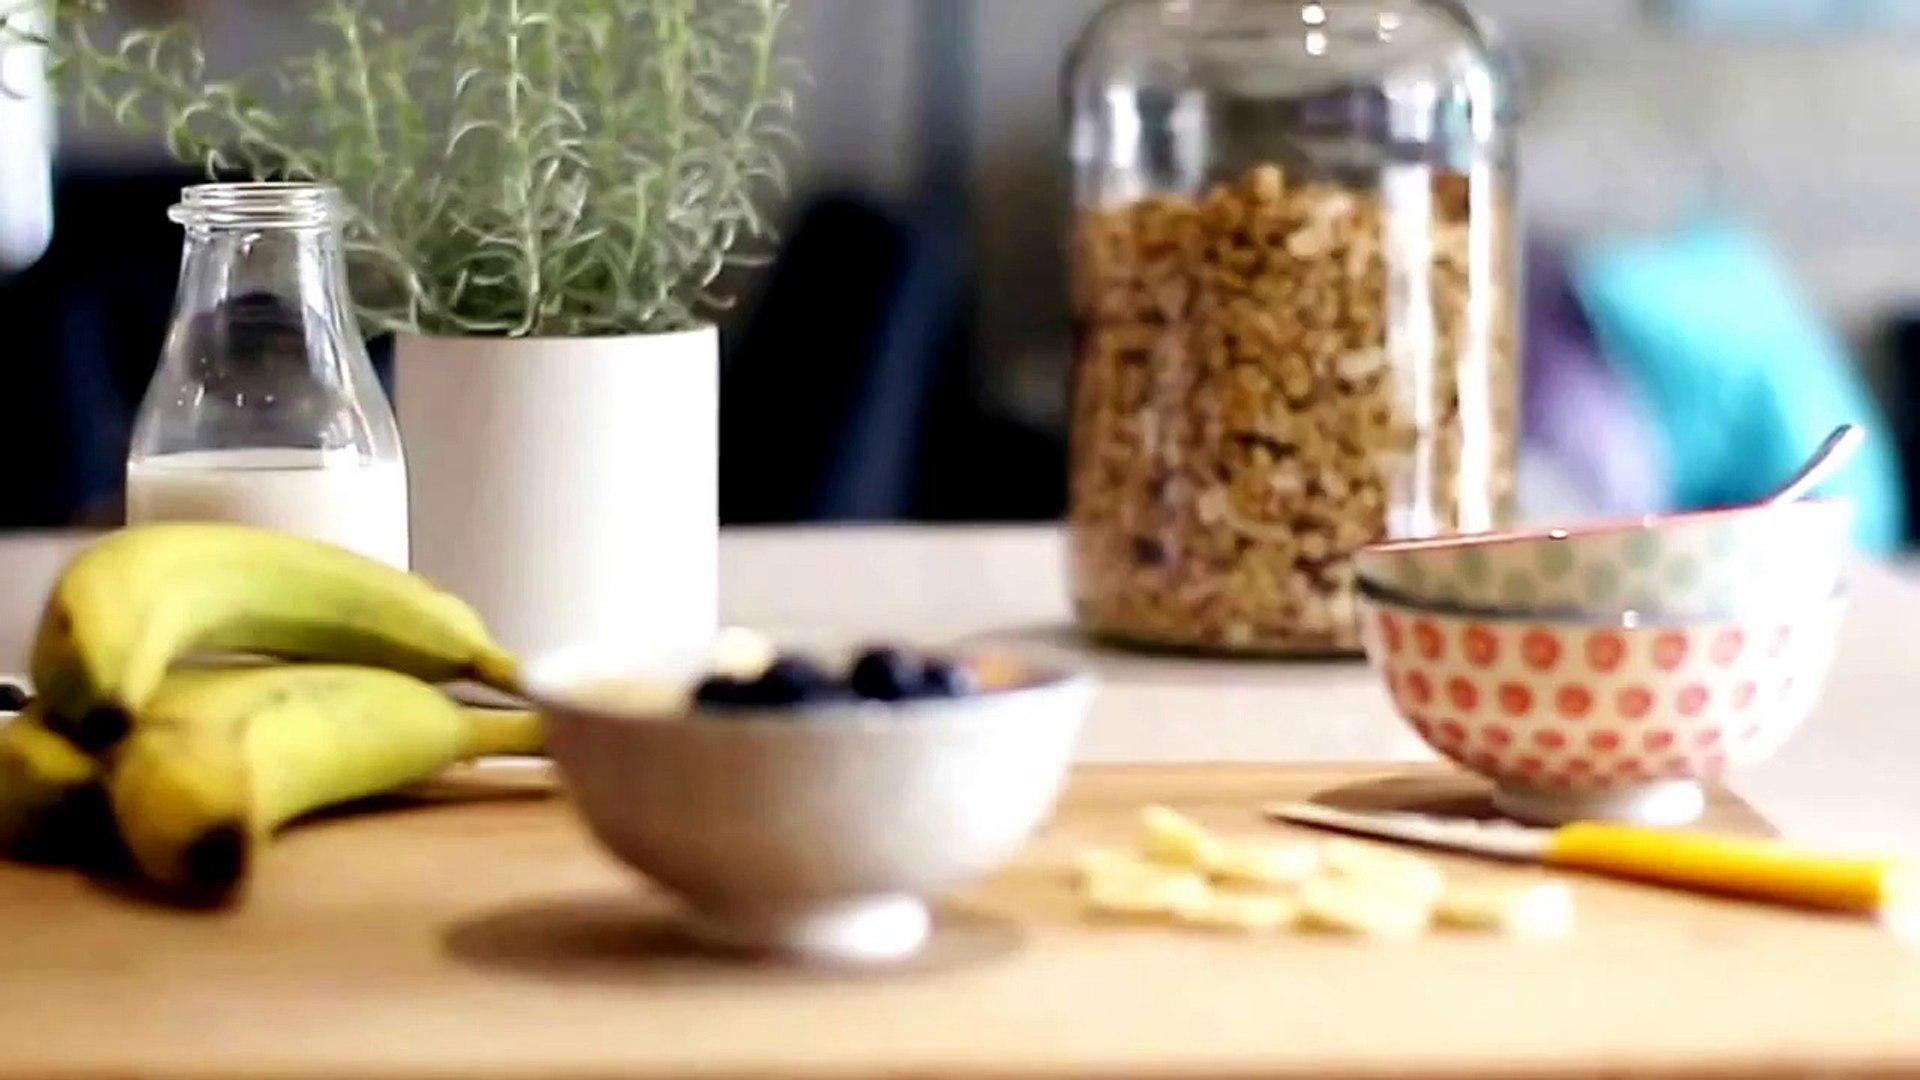 Fruit Smoothie Recipes - Blueberry Smoothie Recipes